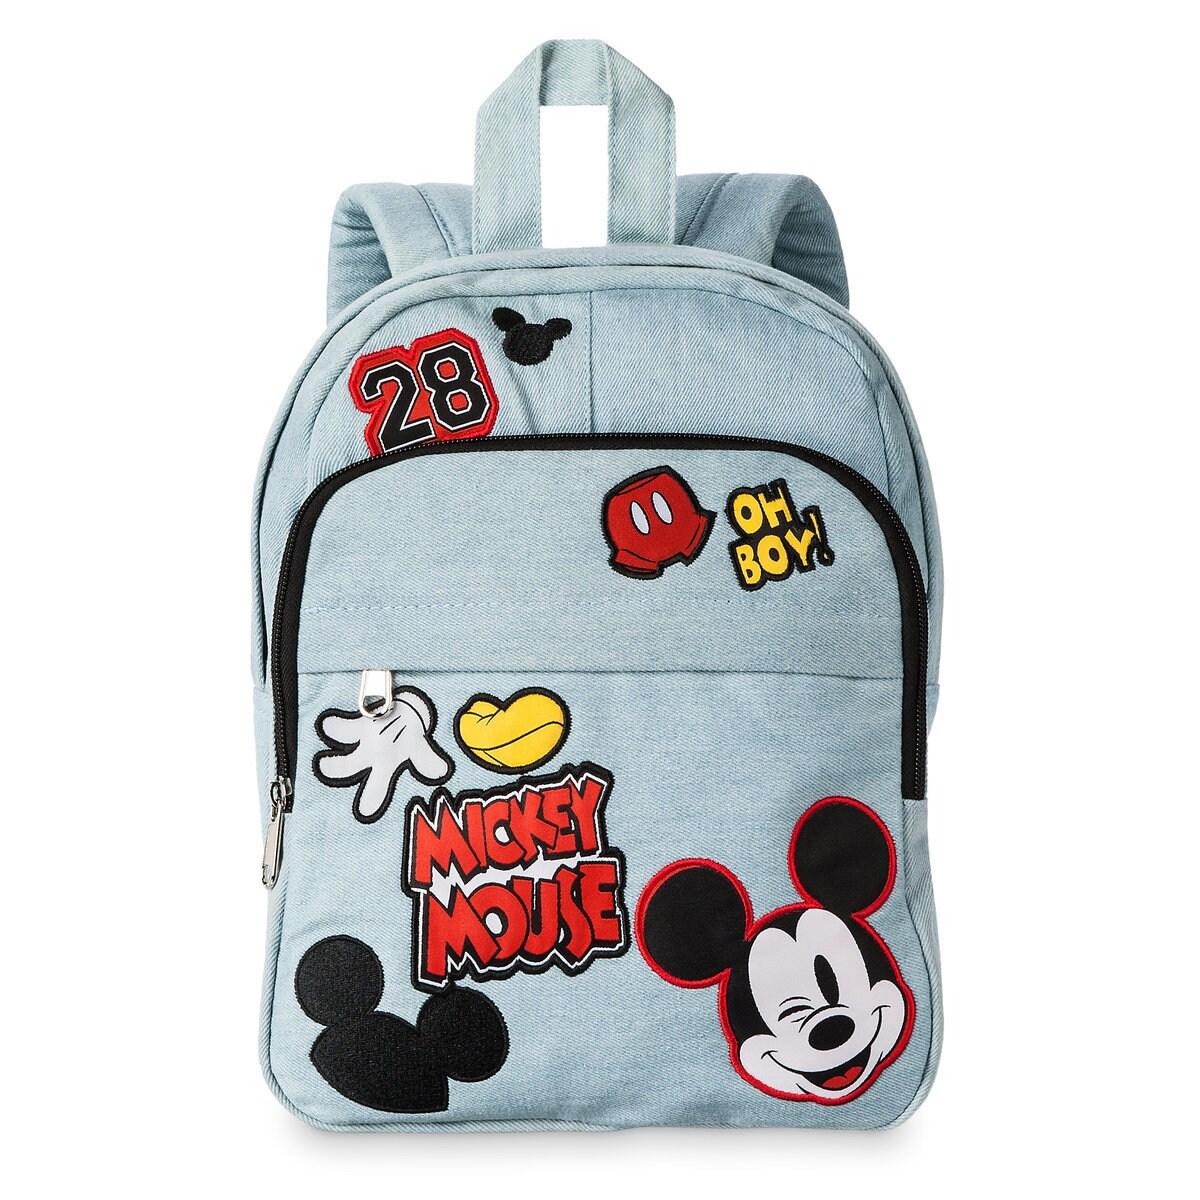 Top Quality Women's Backpack Teenage Girls Travel Bag PU Leather Handmade  Flower Embroidered Backpacks mochila feminina-in Backpacks from Luggage &  Bags on ...